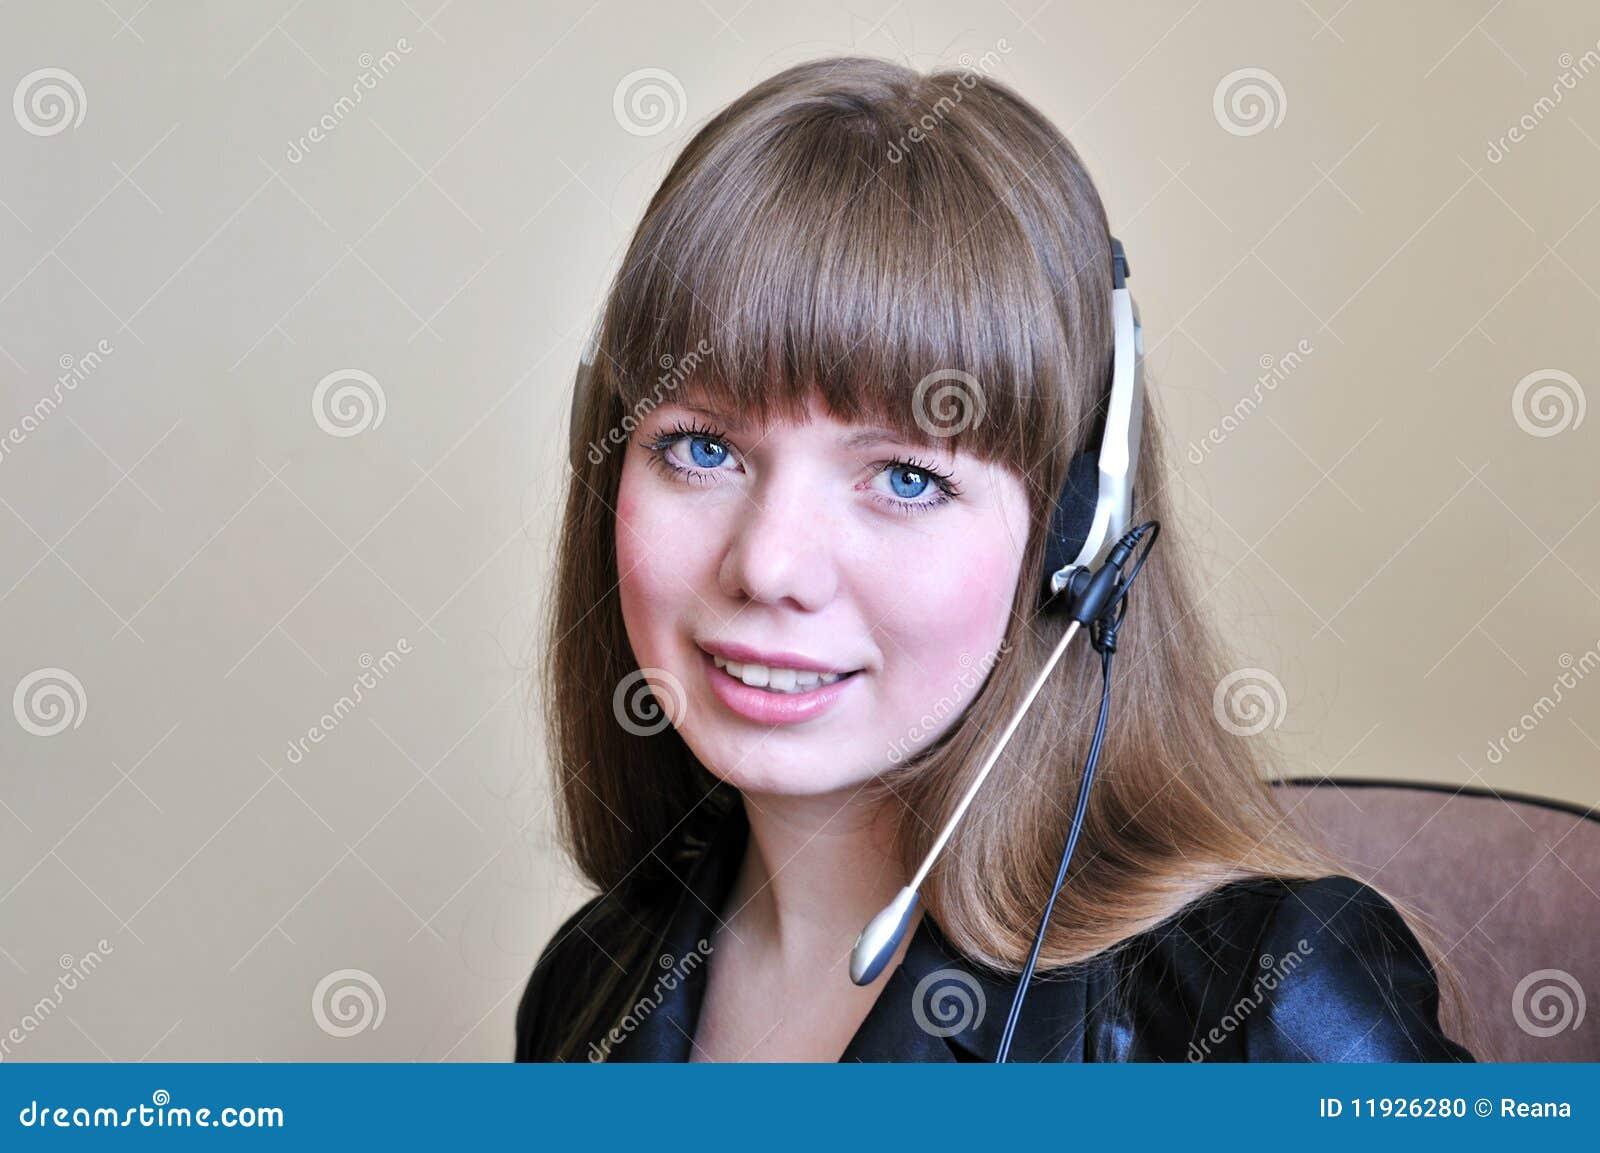 Blue-eyed girl operator